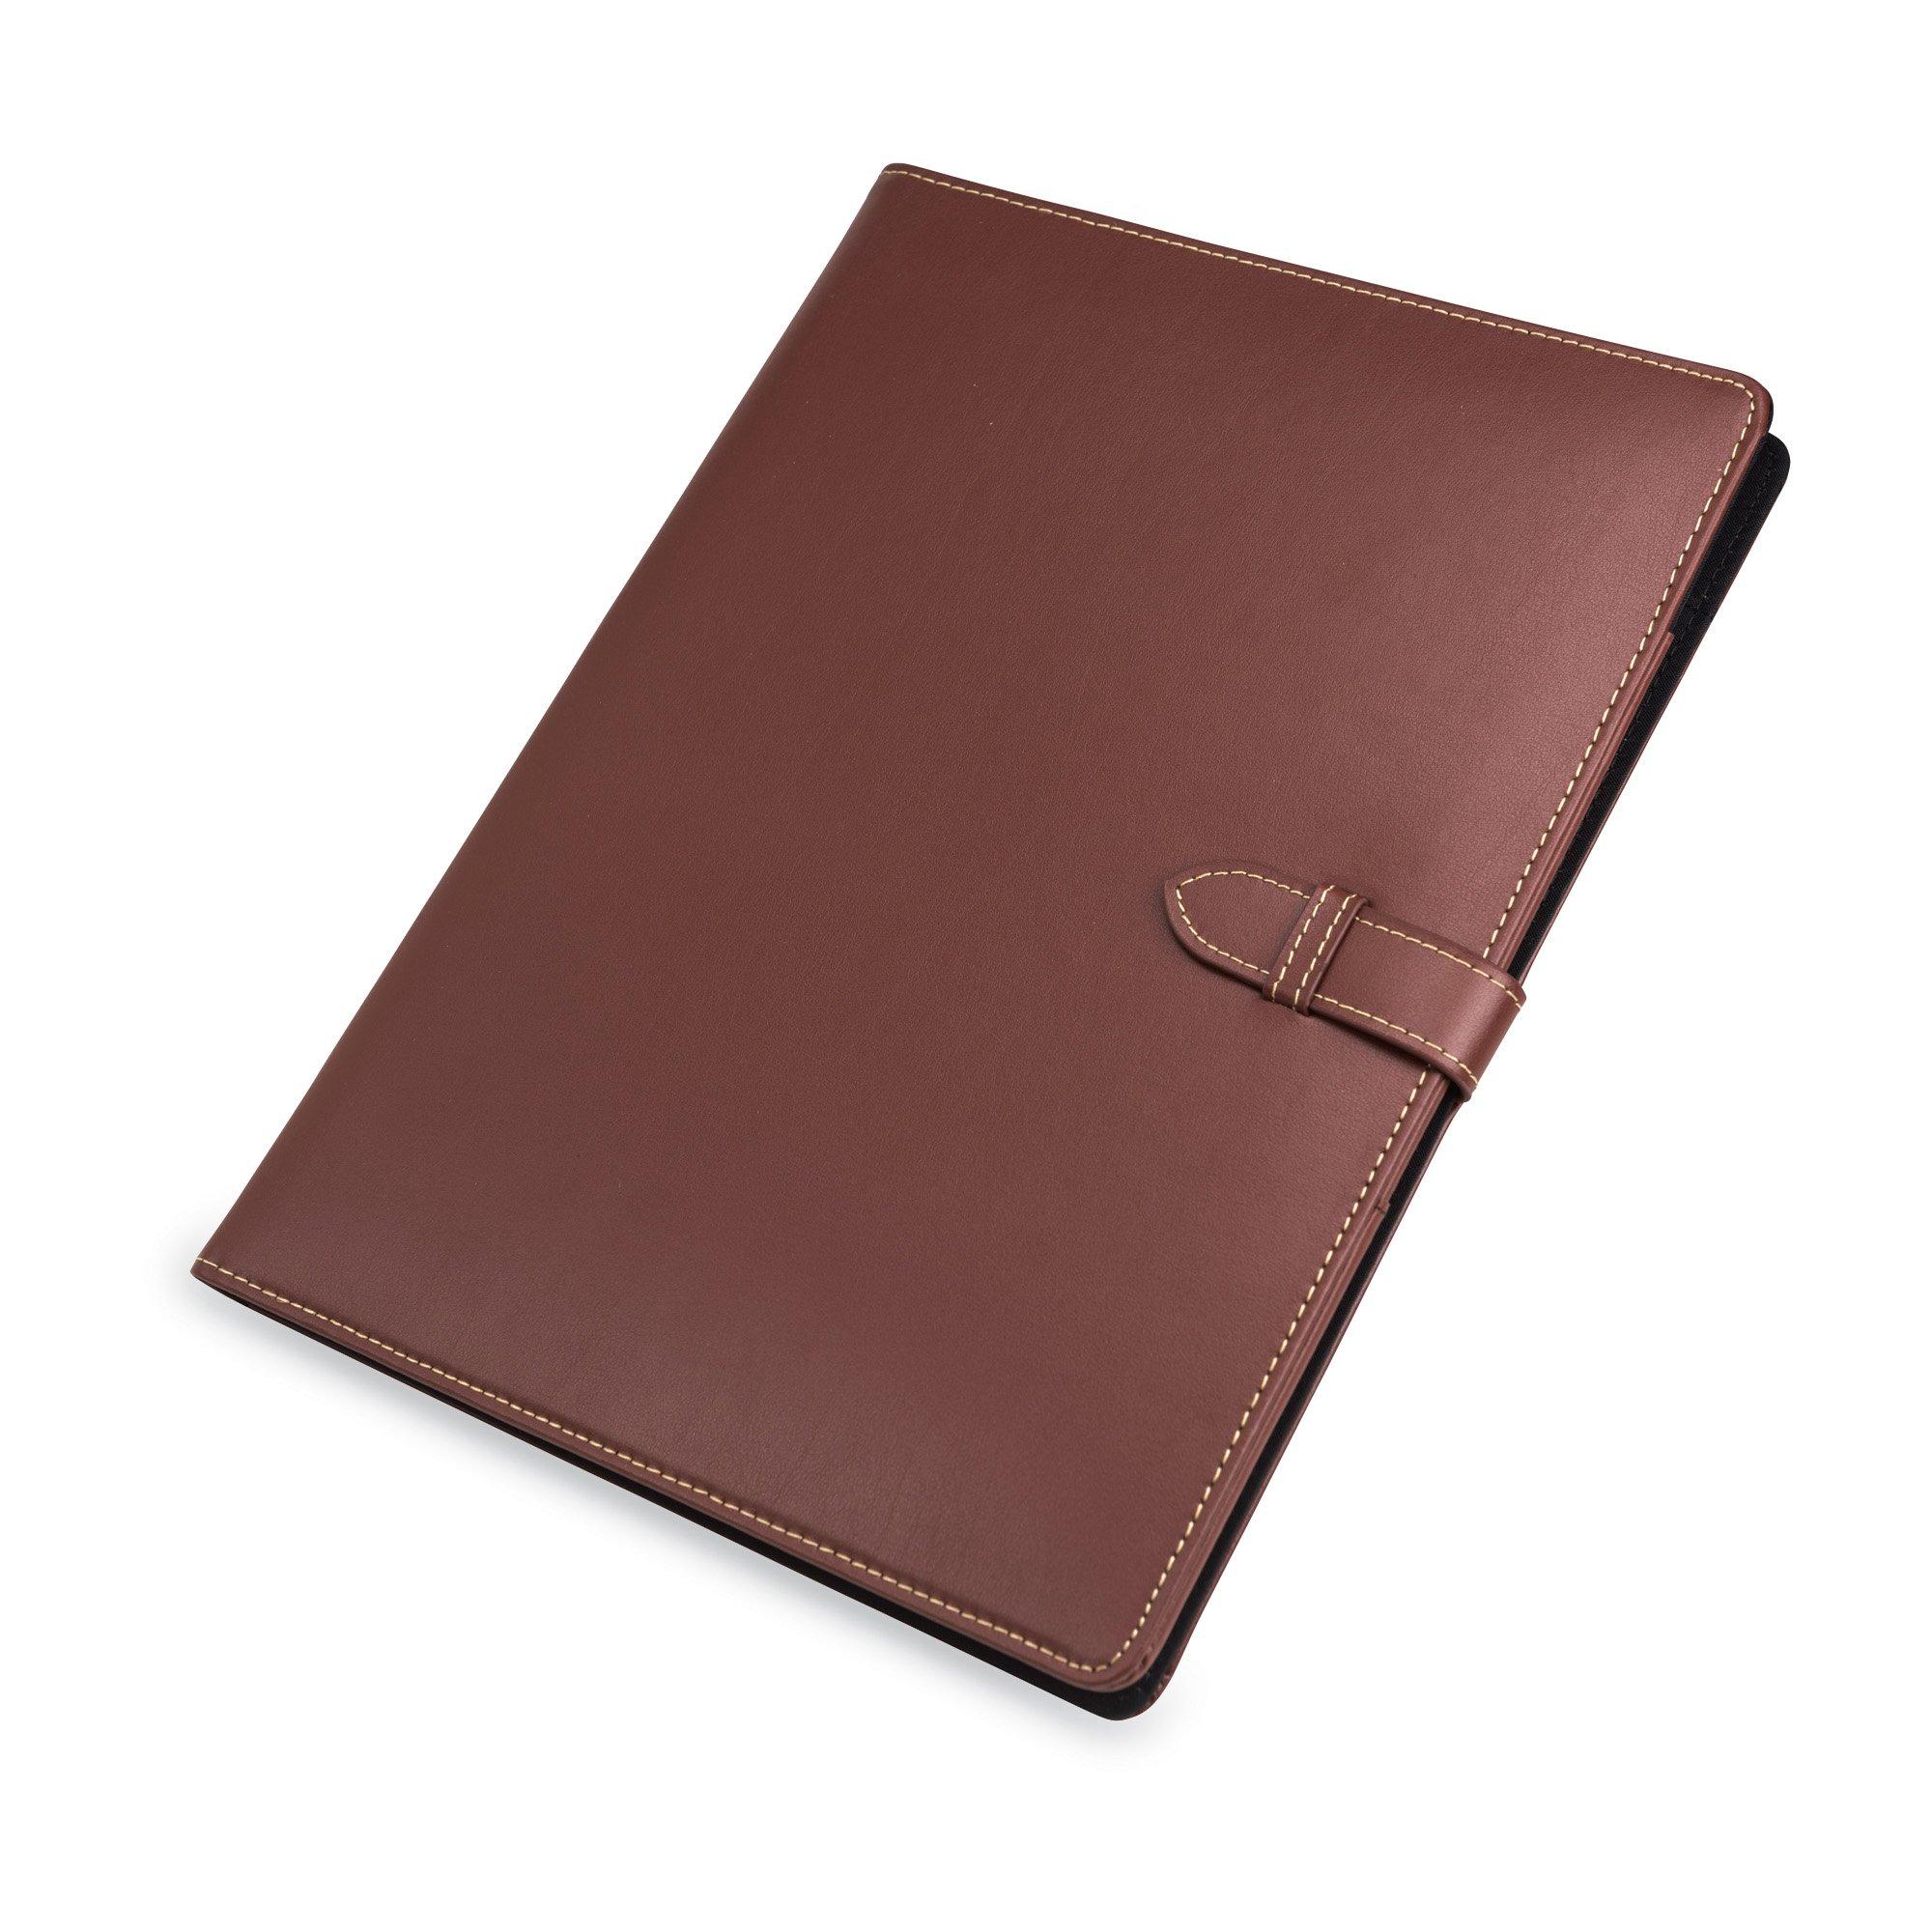 Samsill Contrast Stitch Leather Padfolio with Strape Closure– Portfolio Folder/Business Portfolio for Men & Women – Resume Document Organizer, 8.5 x 11 Writing Pad, Tan